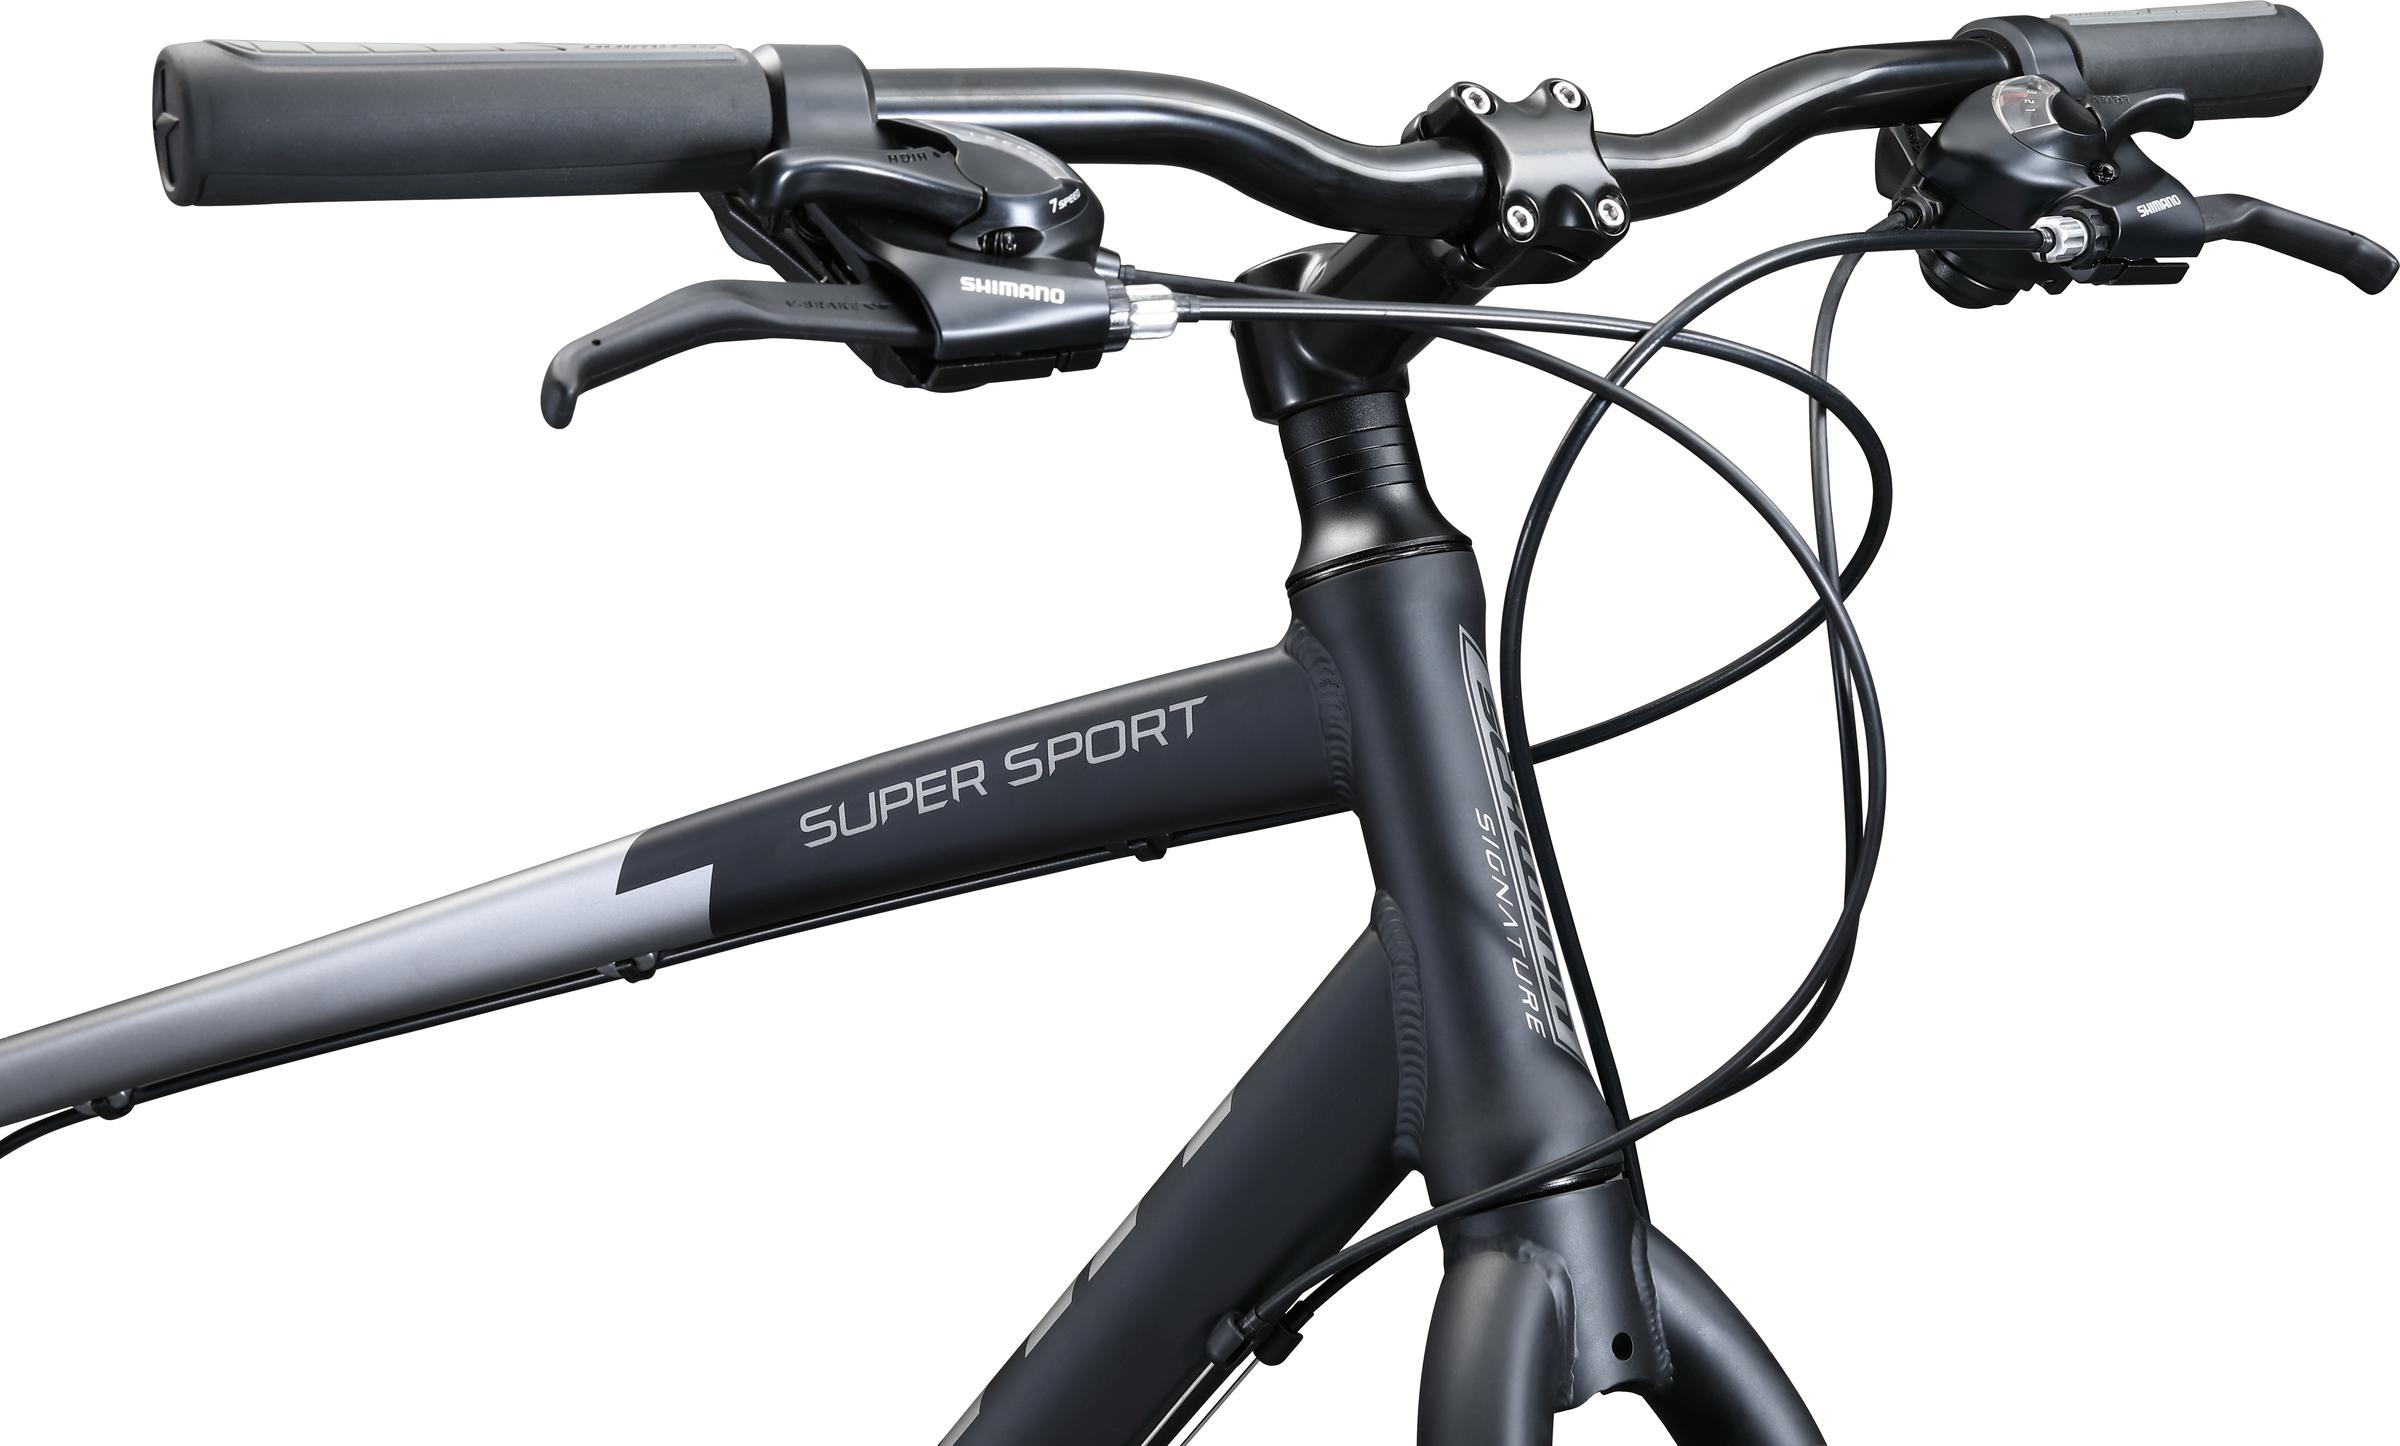 aaa76f21c9b Schwinn Super Sport - Incycle Bicycles | Southern California